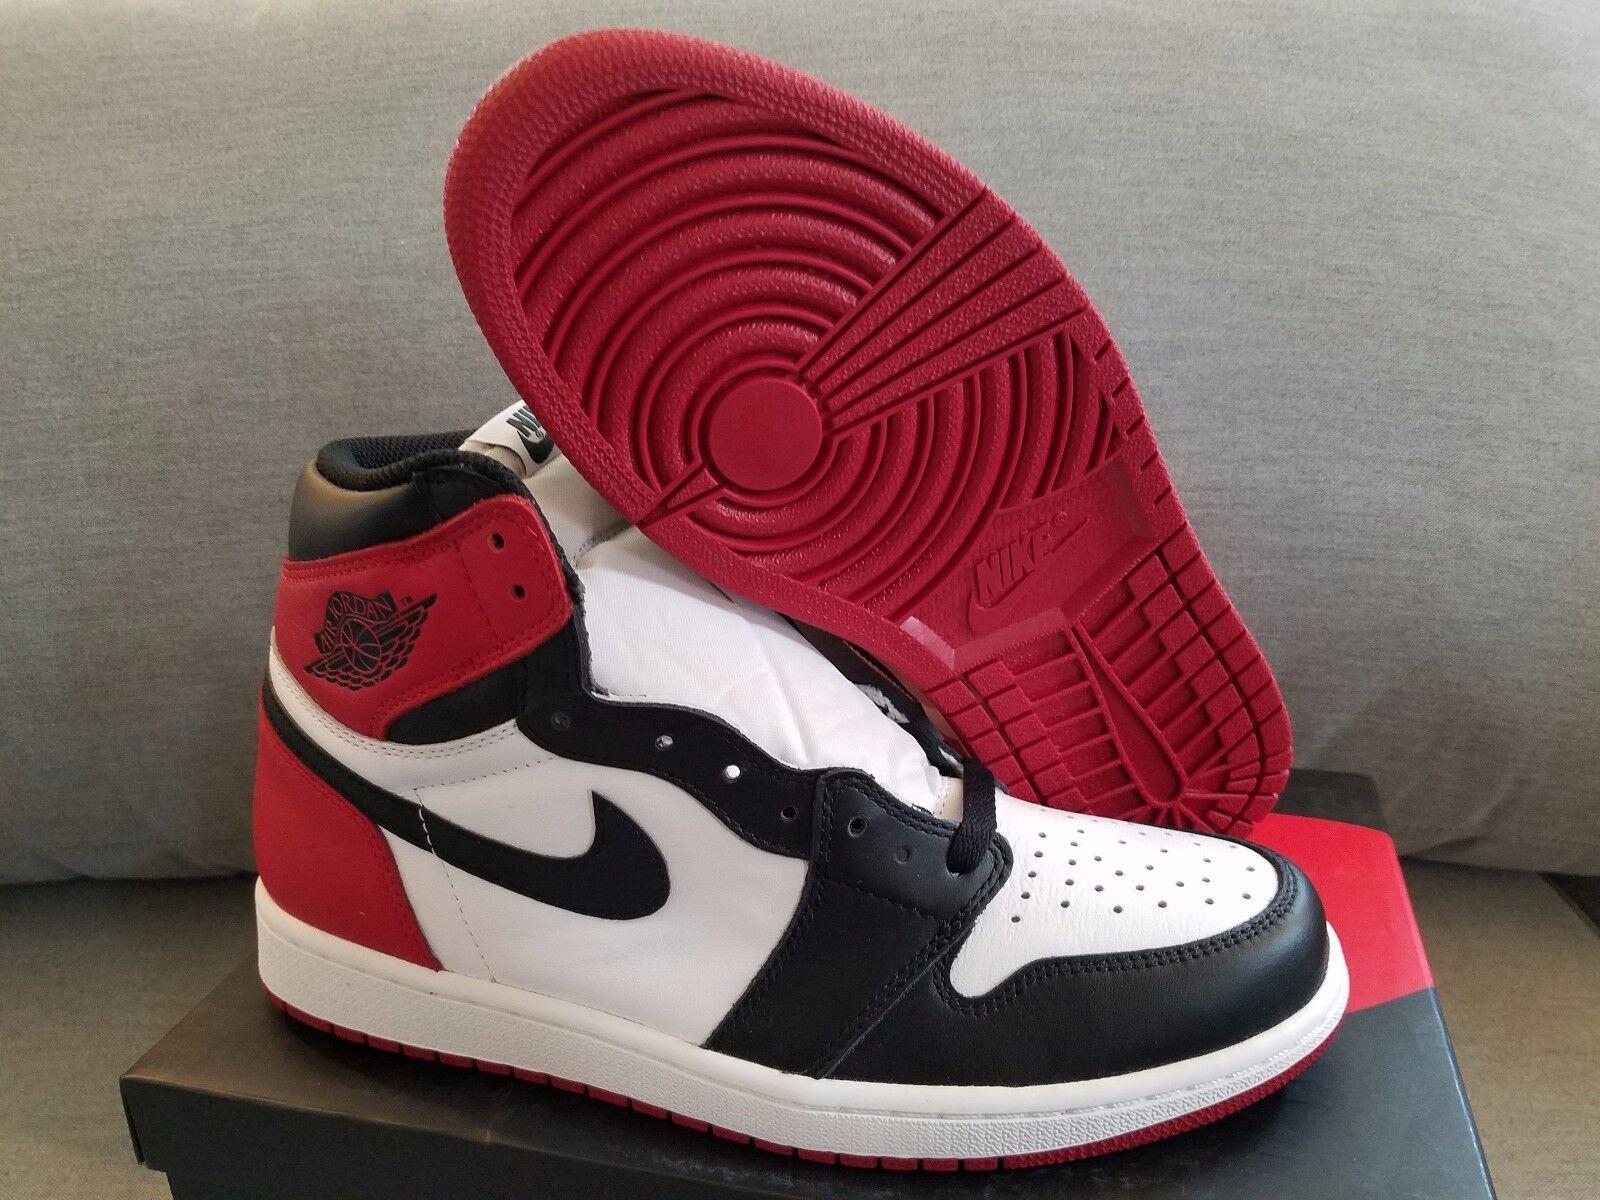 Nike air Jordan 1 Retro Black Toe SAMPLE KAWS DS red tow bred banned